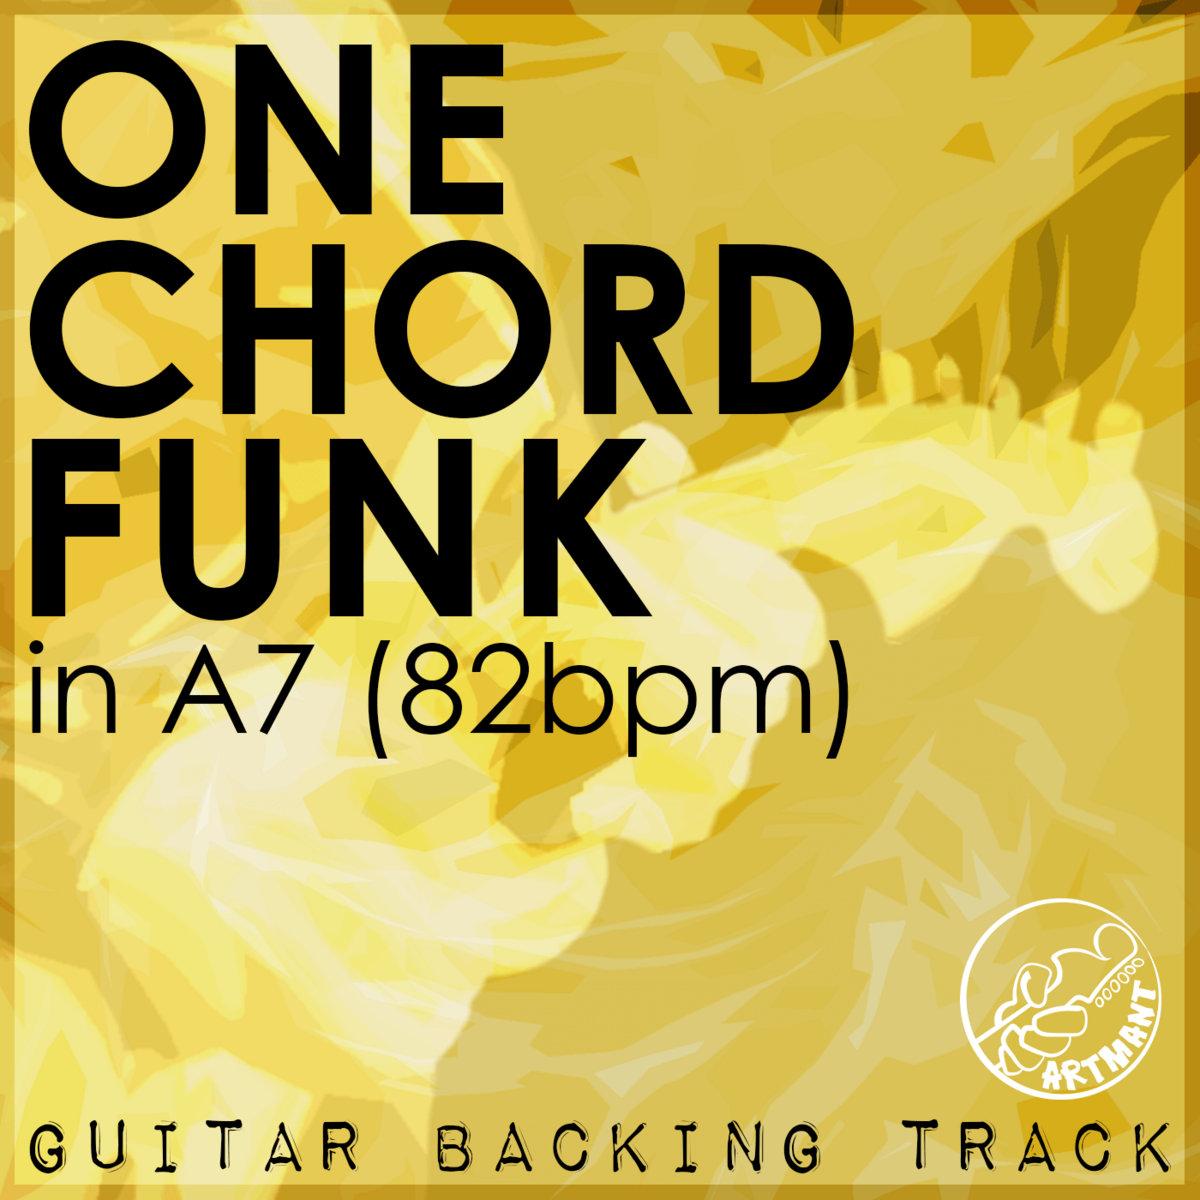 One Chord Backing Track In A7 82bpm Artmant Studios